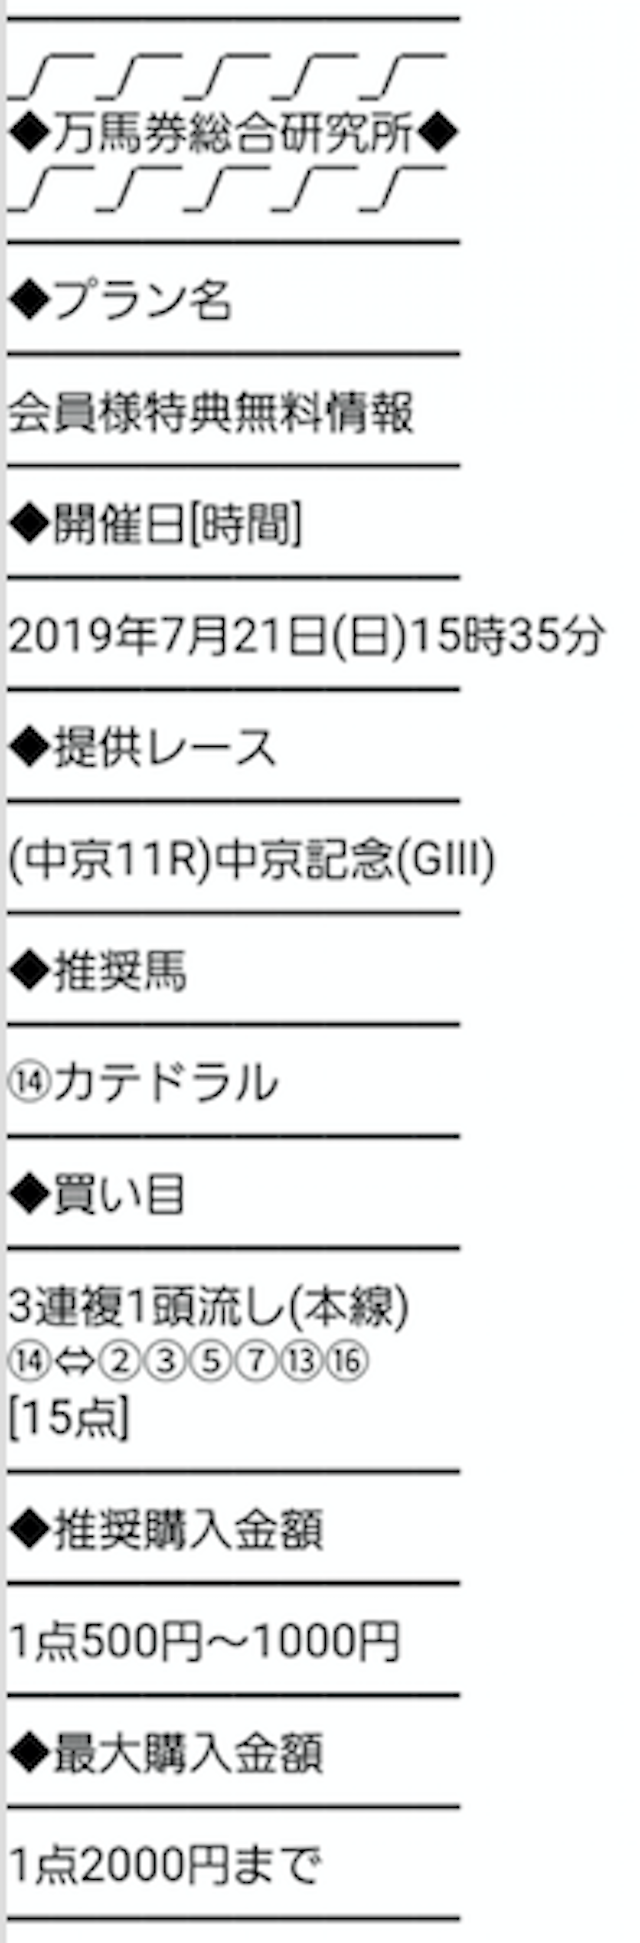 tokyo0330